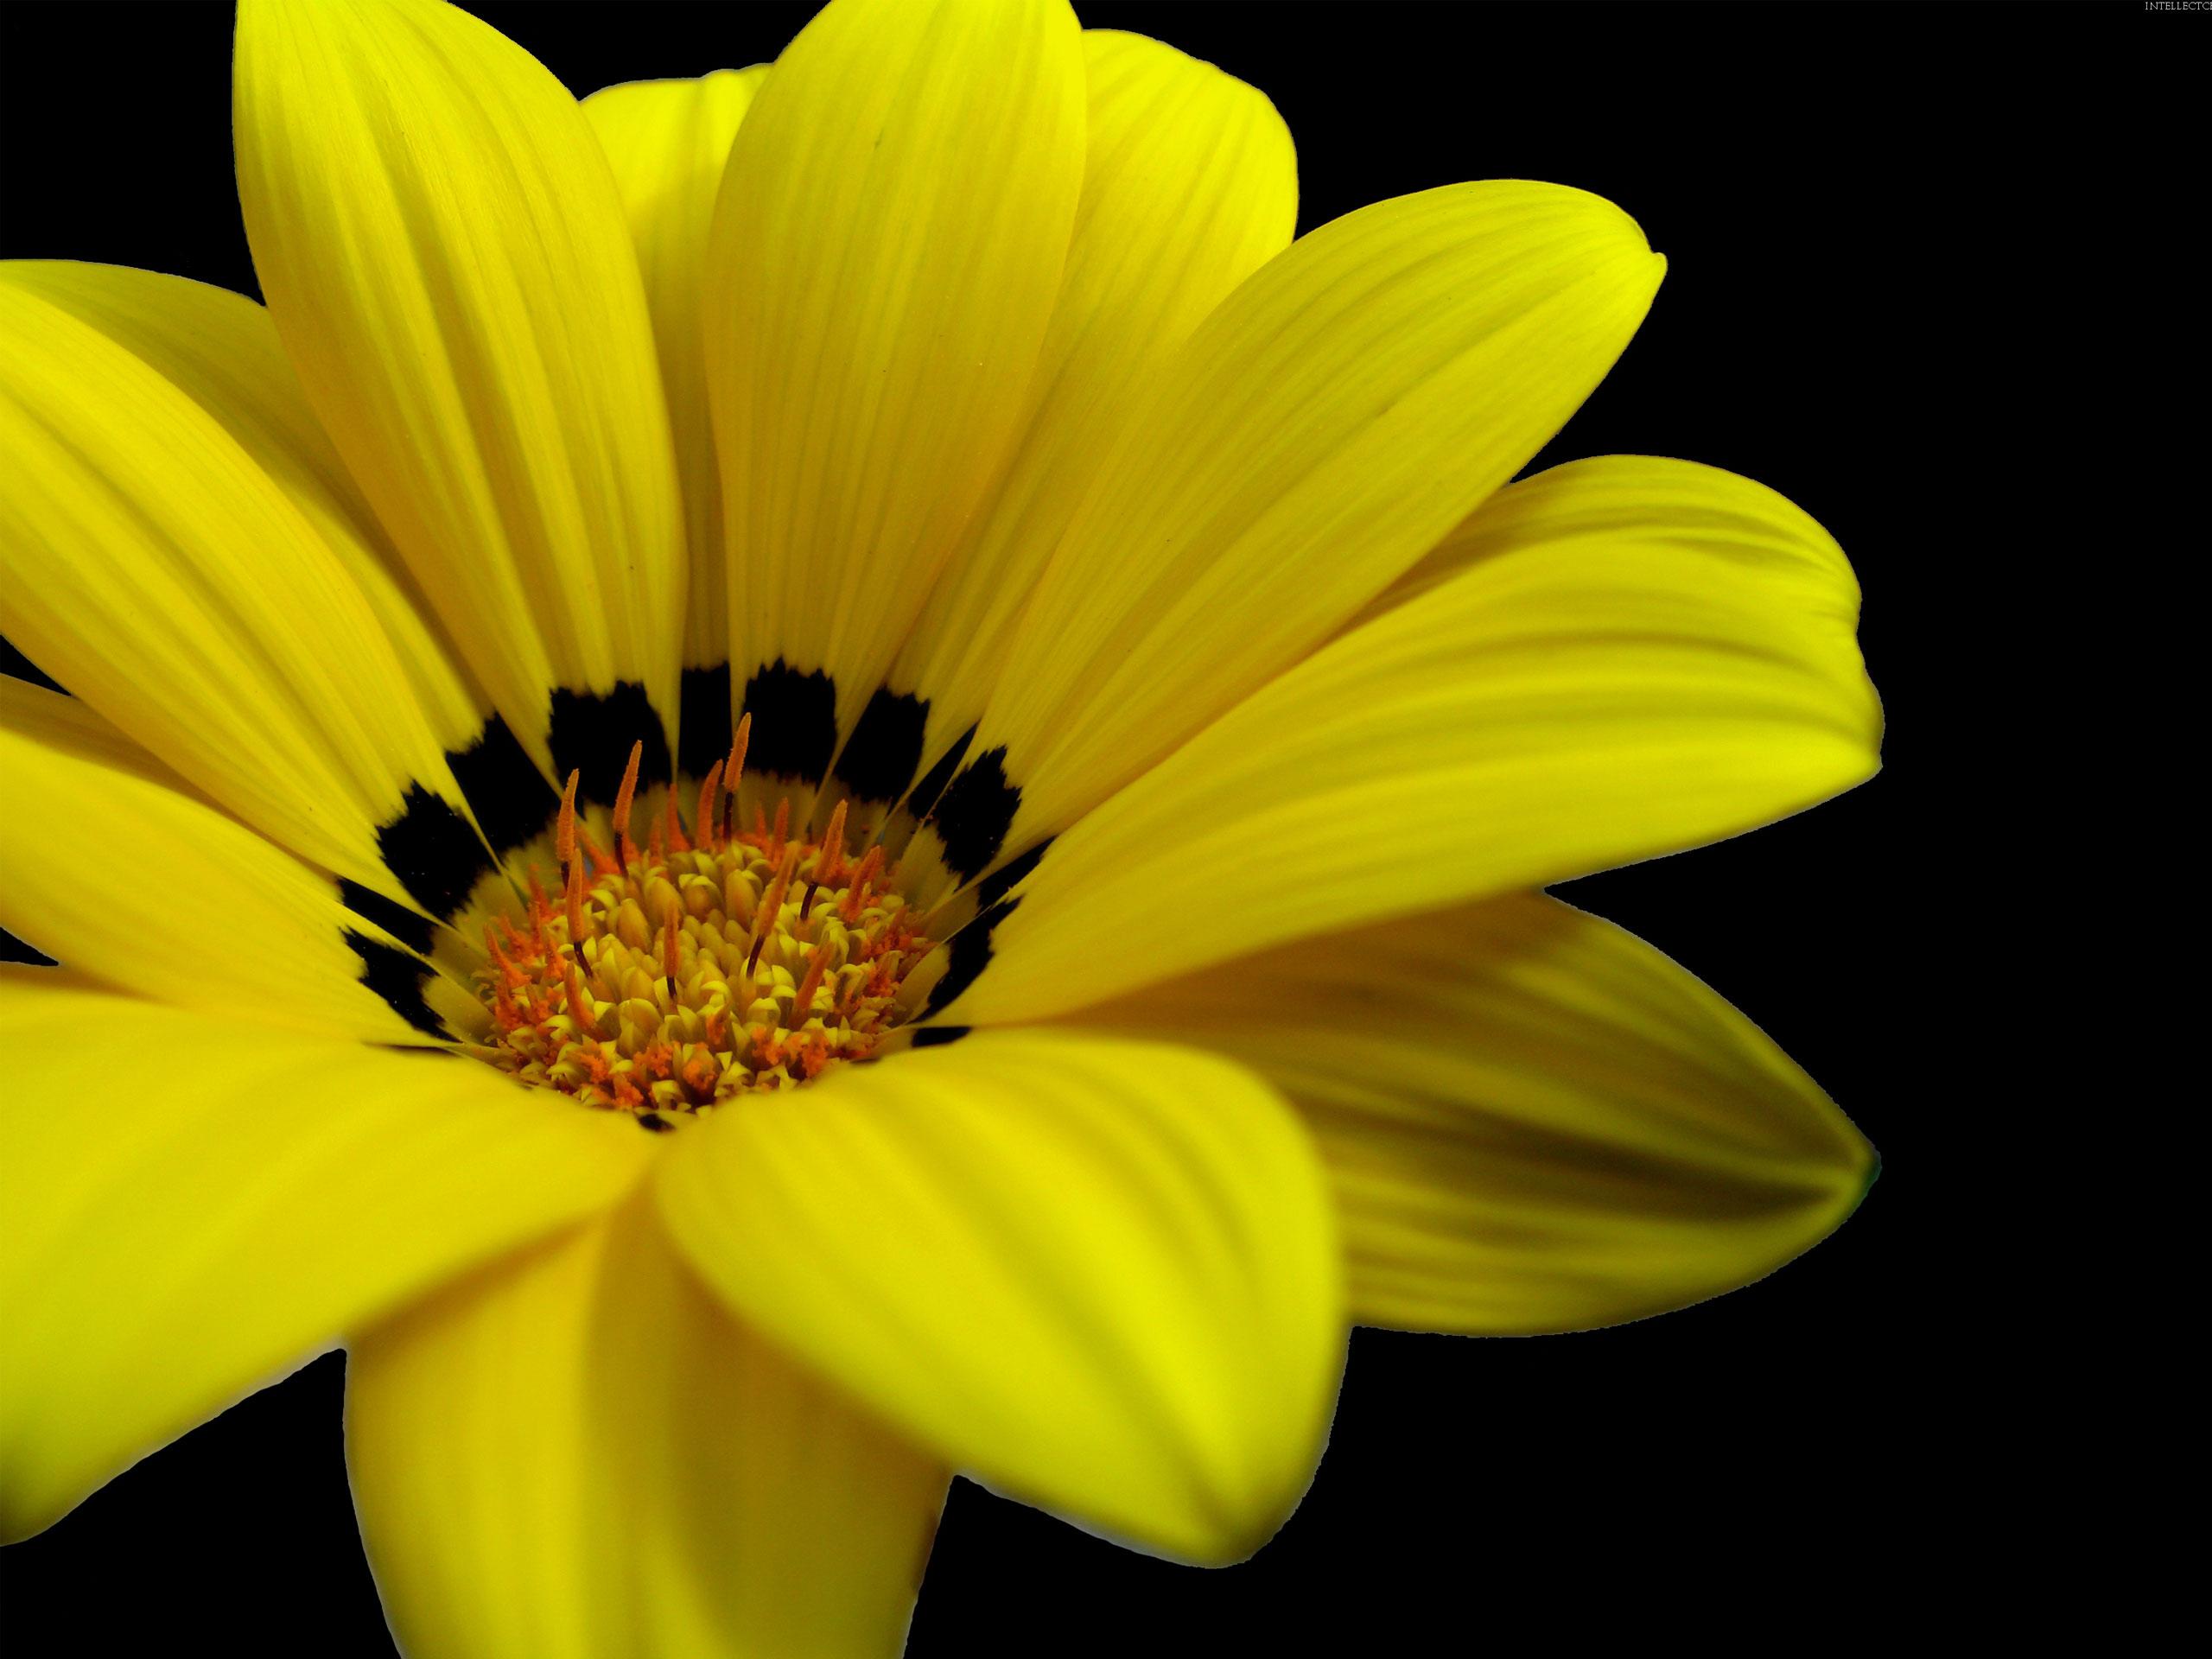 Стиль открыток, картинки с желтыми цветами